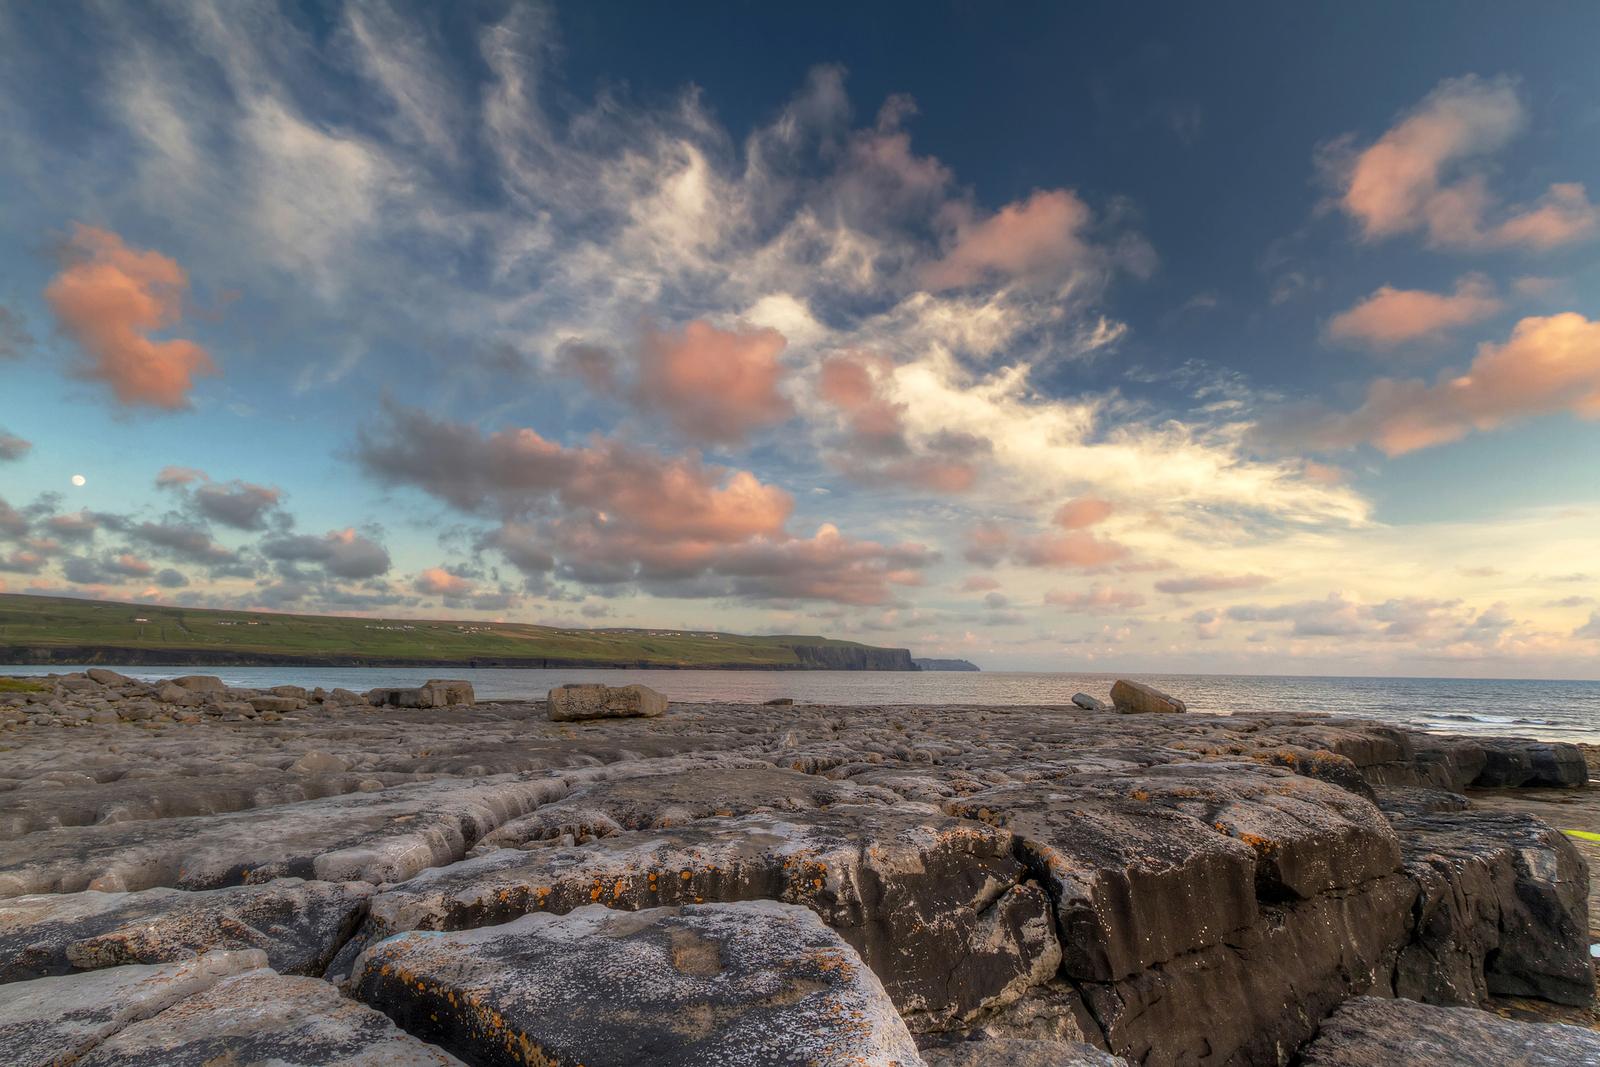 bigstock-Burren-at-sunset-21211580